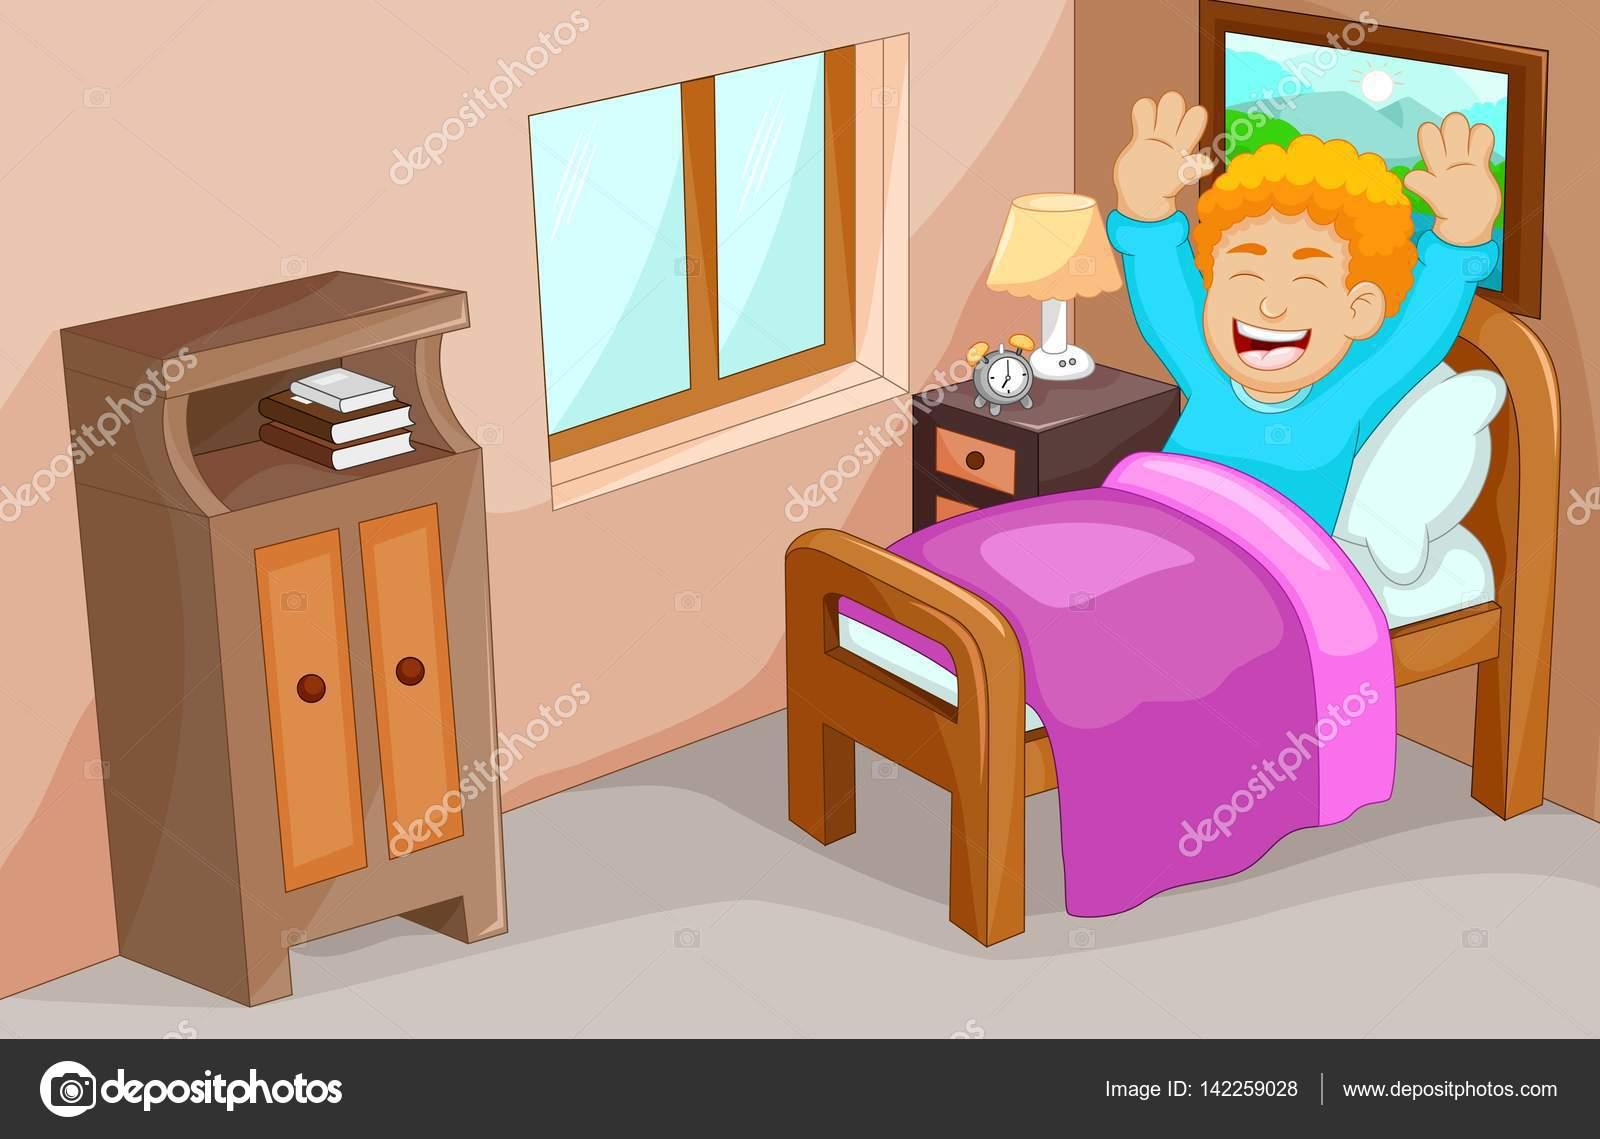 Cute little boy cartoon wake up in the bedroom stock for Dormitorio animado